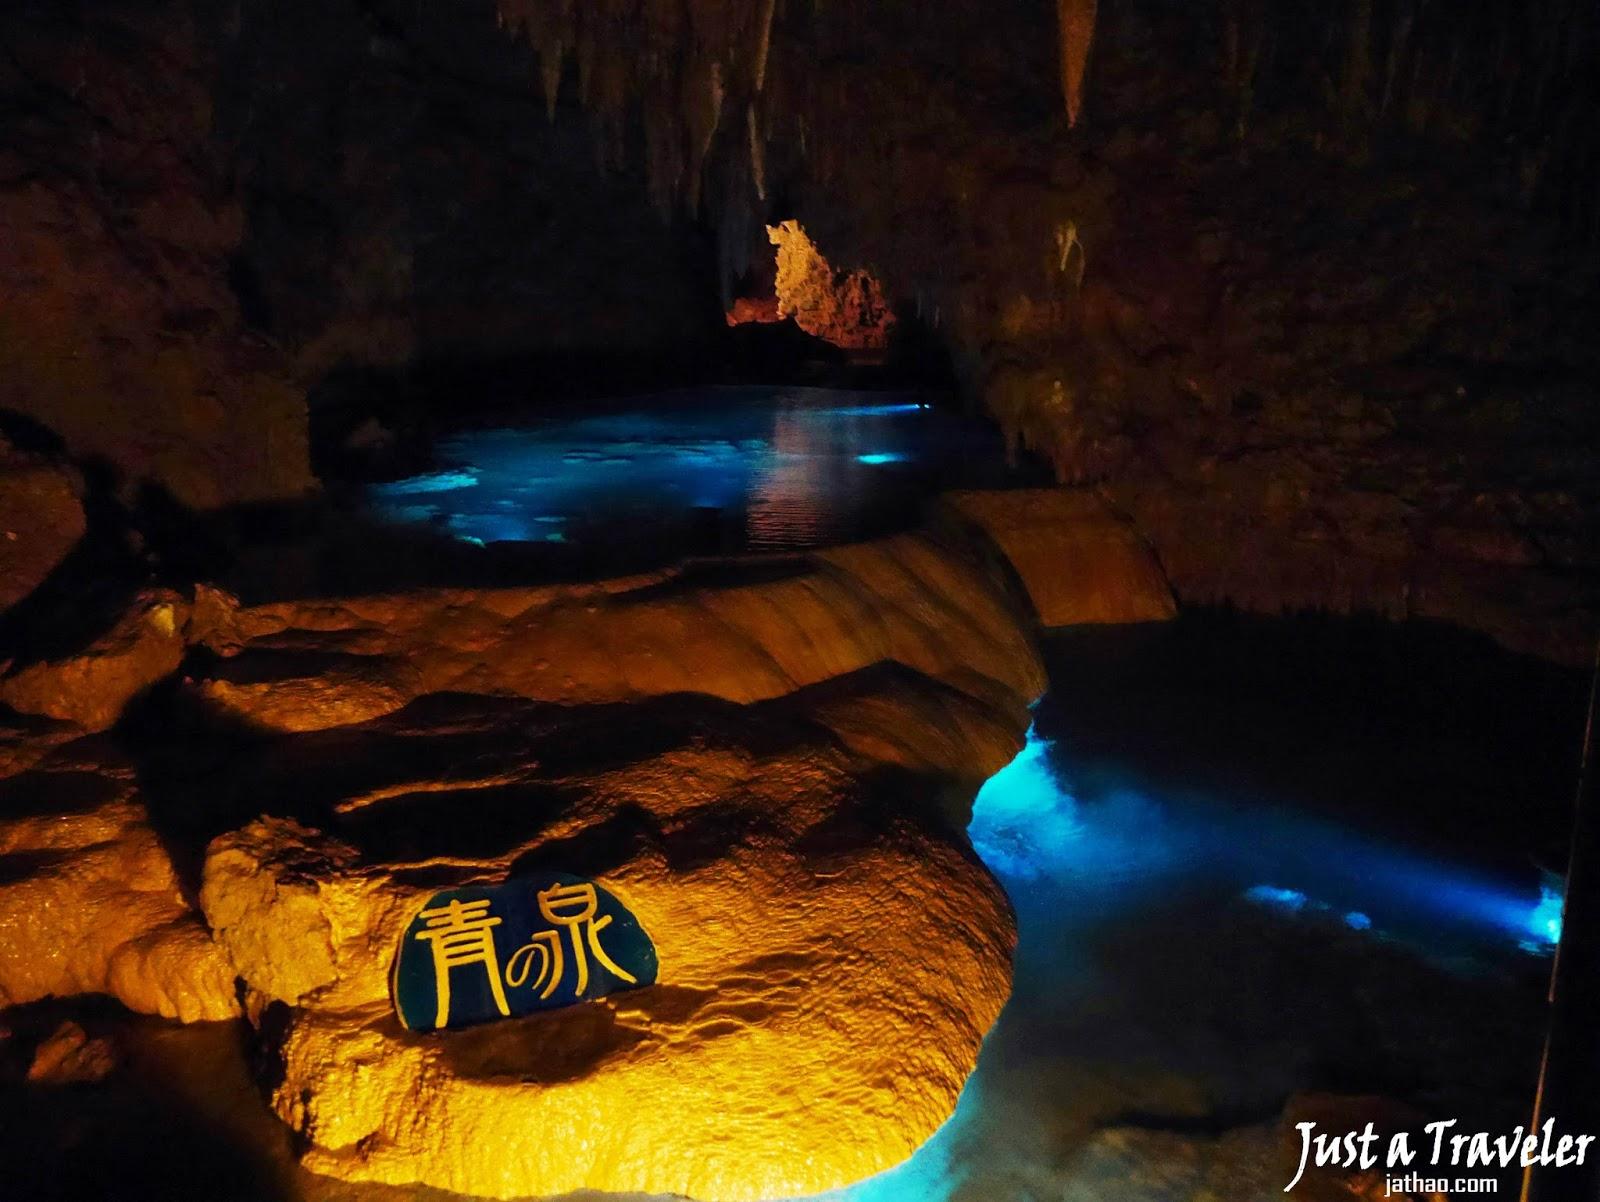 沖繩-景點-推薦-玉泉洞-沖繩世界文化王國-自由行-旅遊-Okinawa-attraction-gyokusendo-Okinawaworld-Toruist-destination